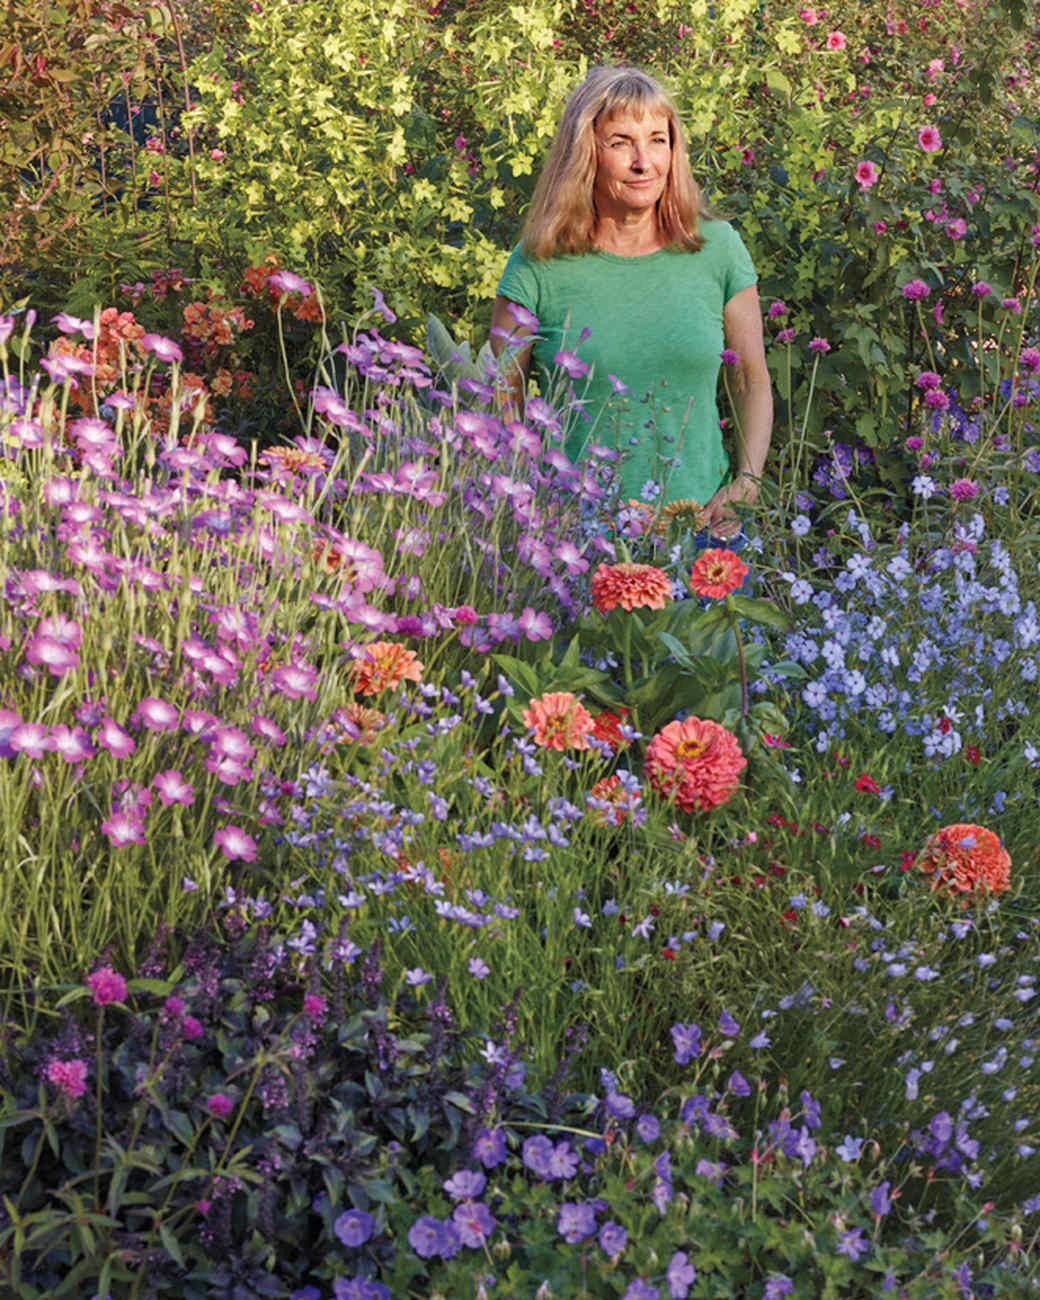 annies-annuals-garden-1507-105-d112384.jpg